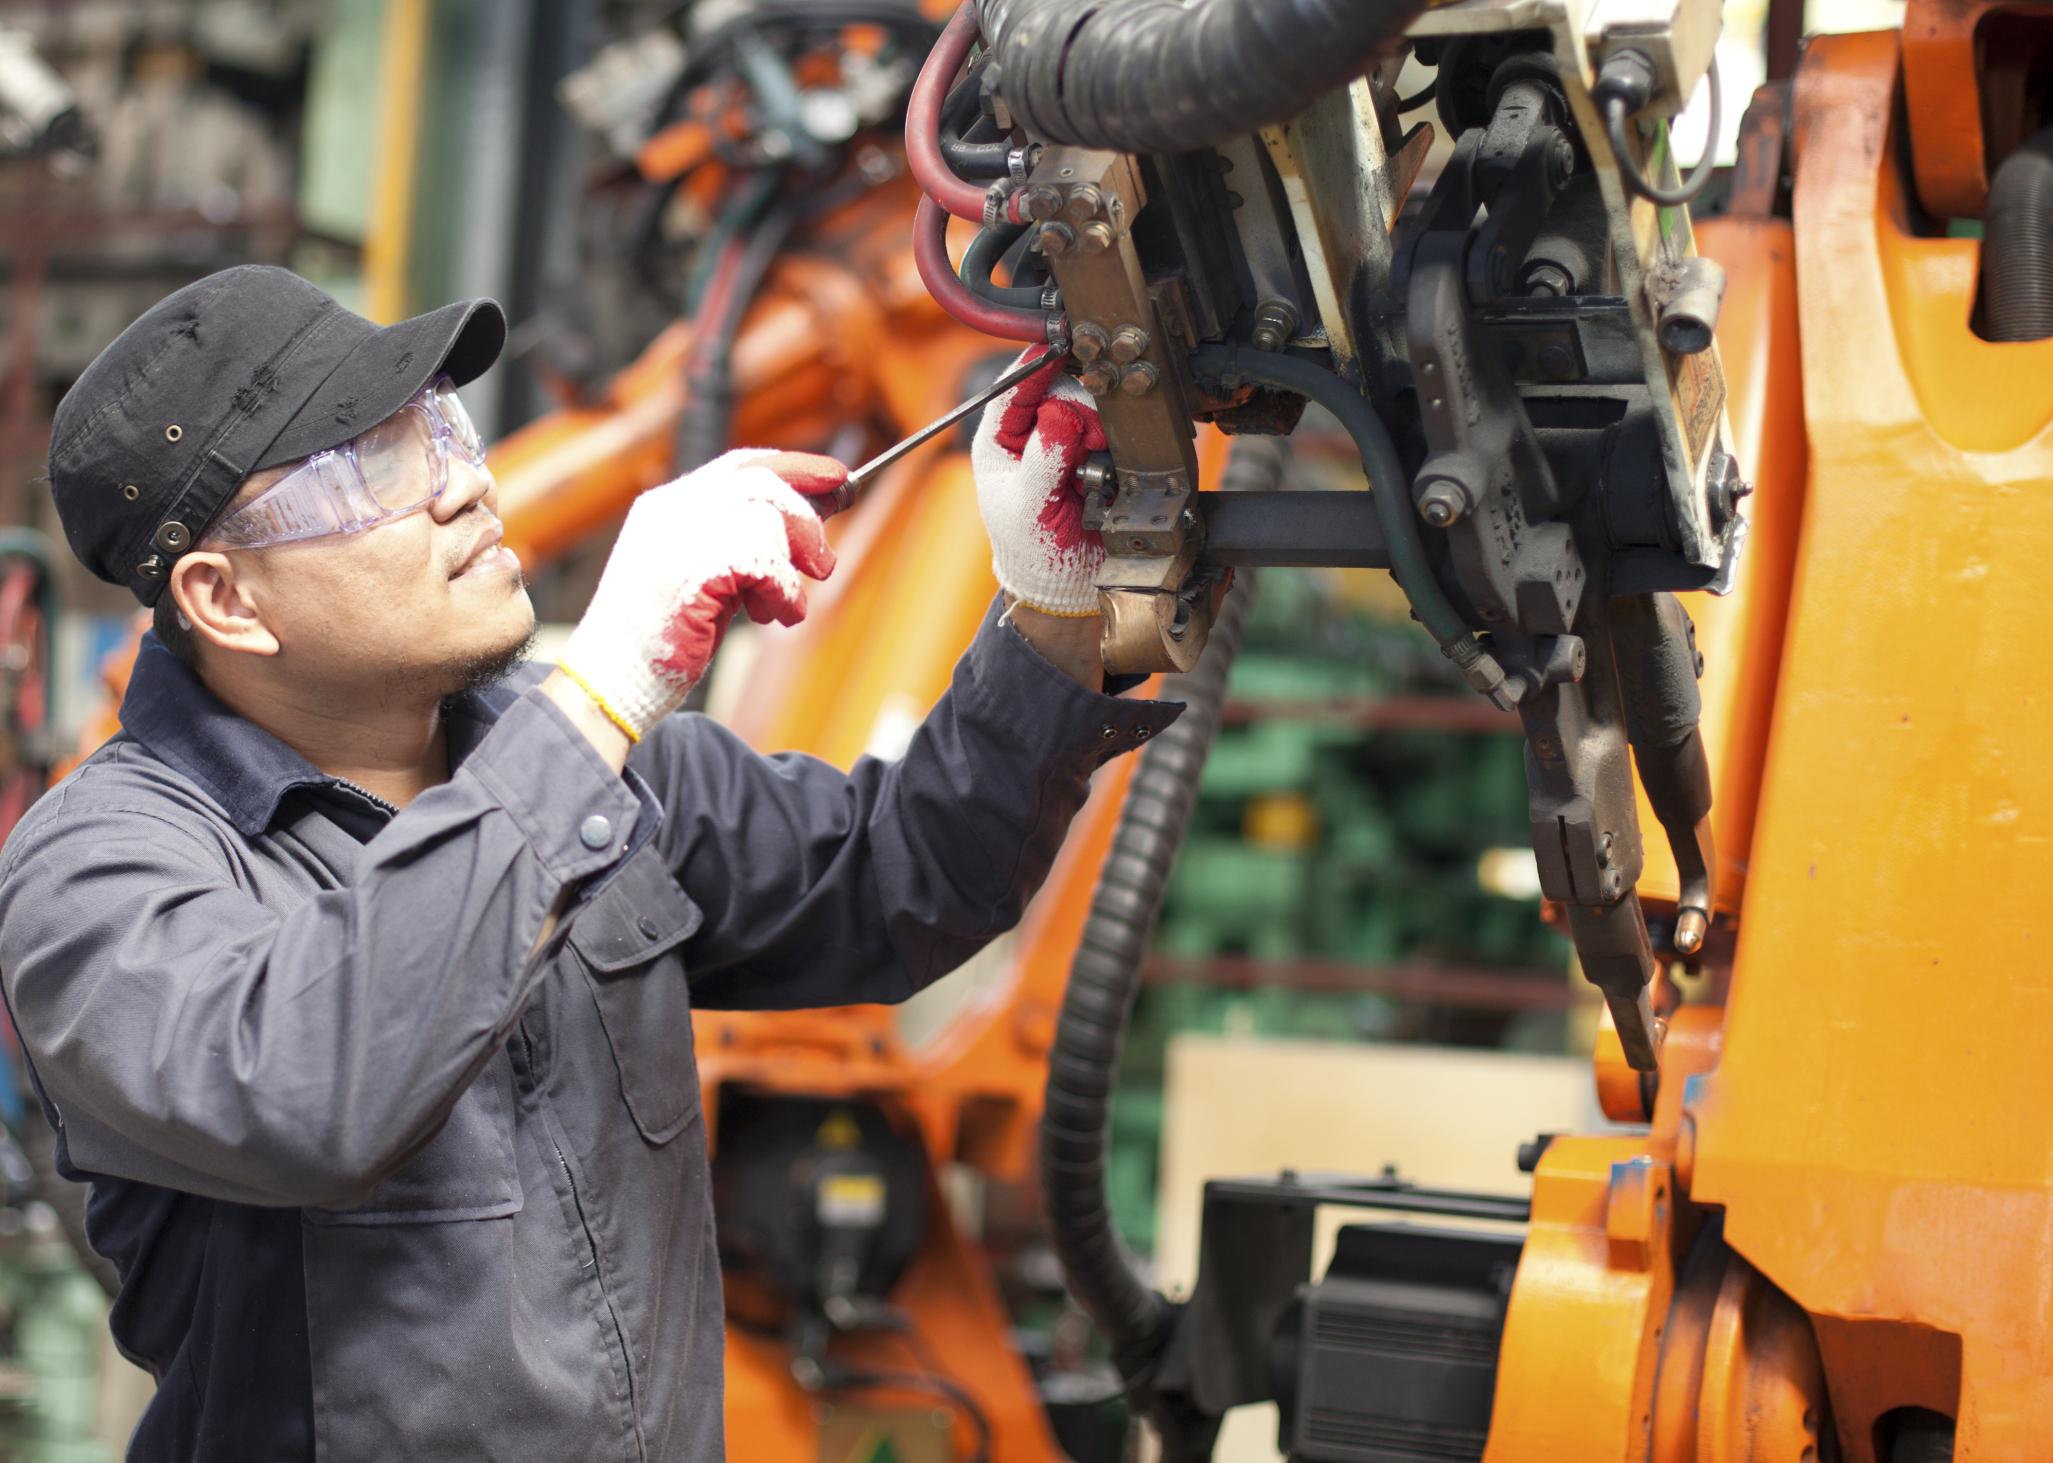 Engineer Employment